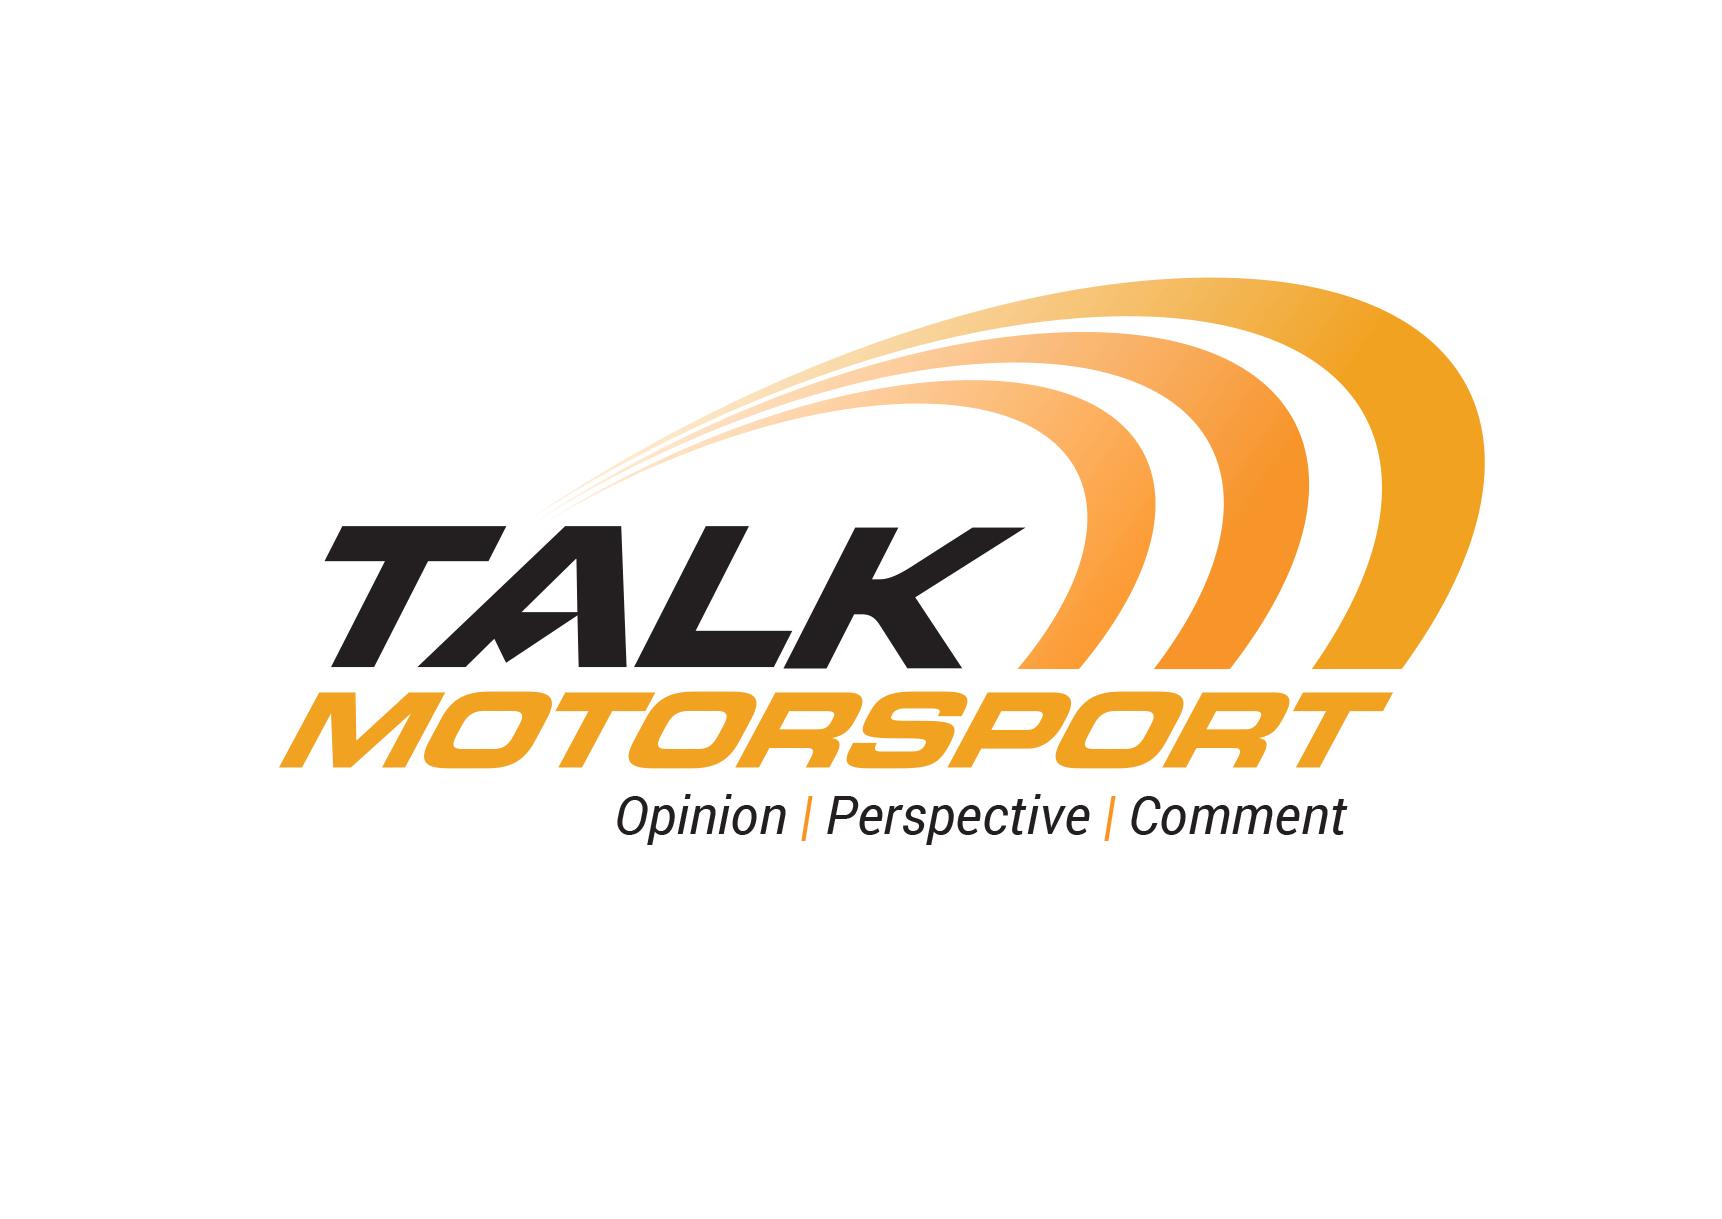 Talk Motorsport logo design - Pinnacle&Co. Christchurch